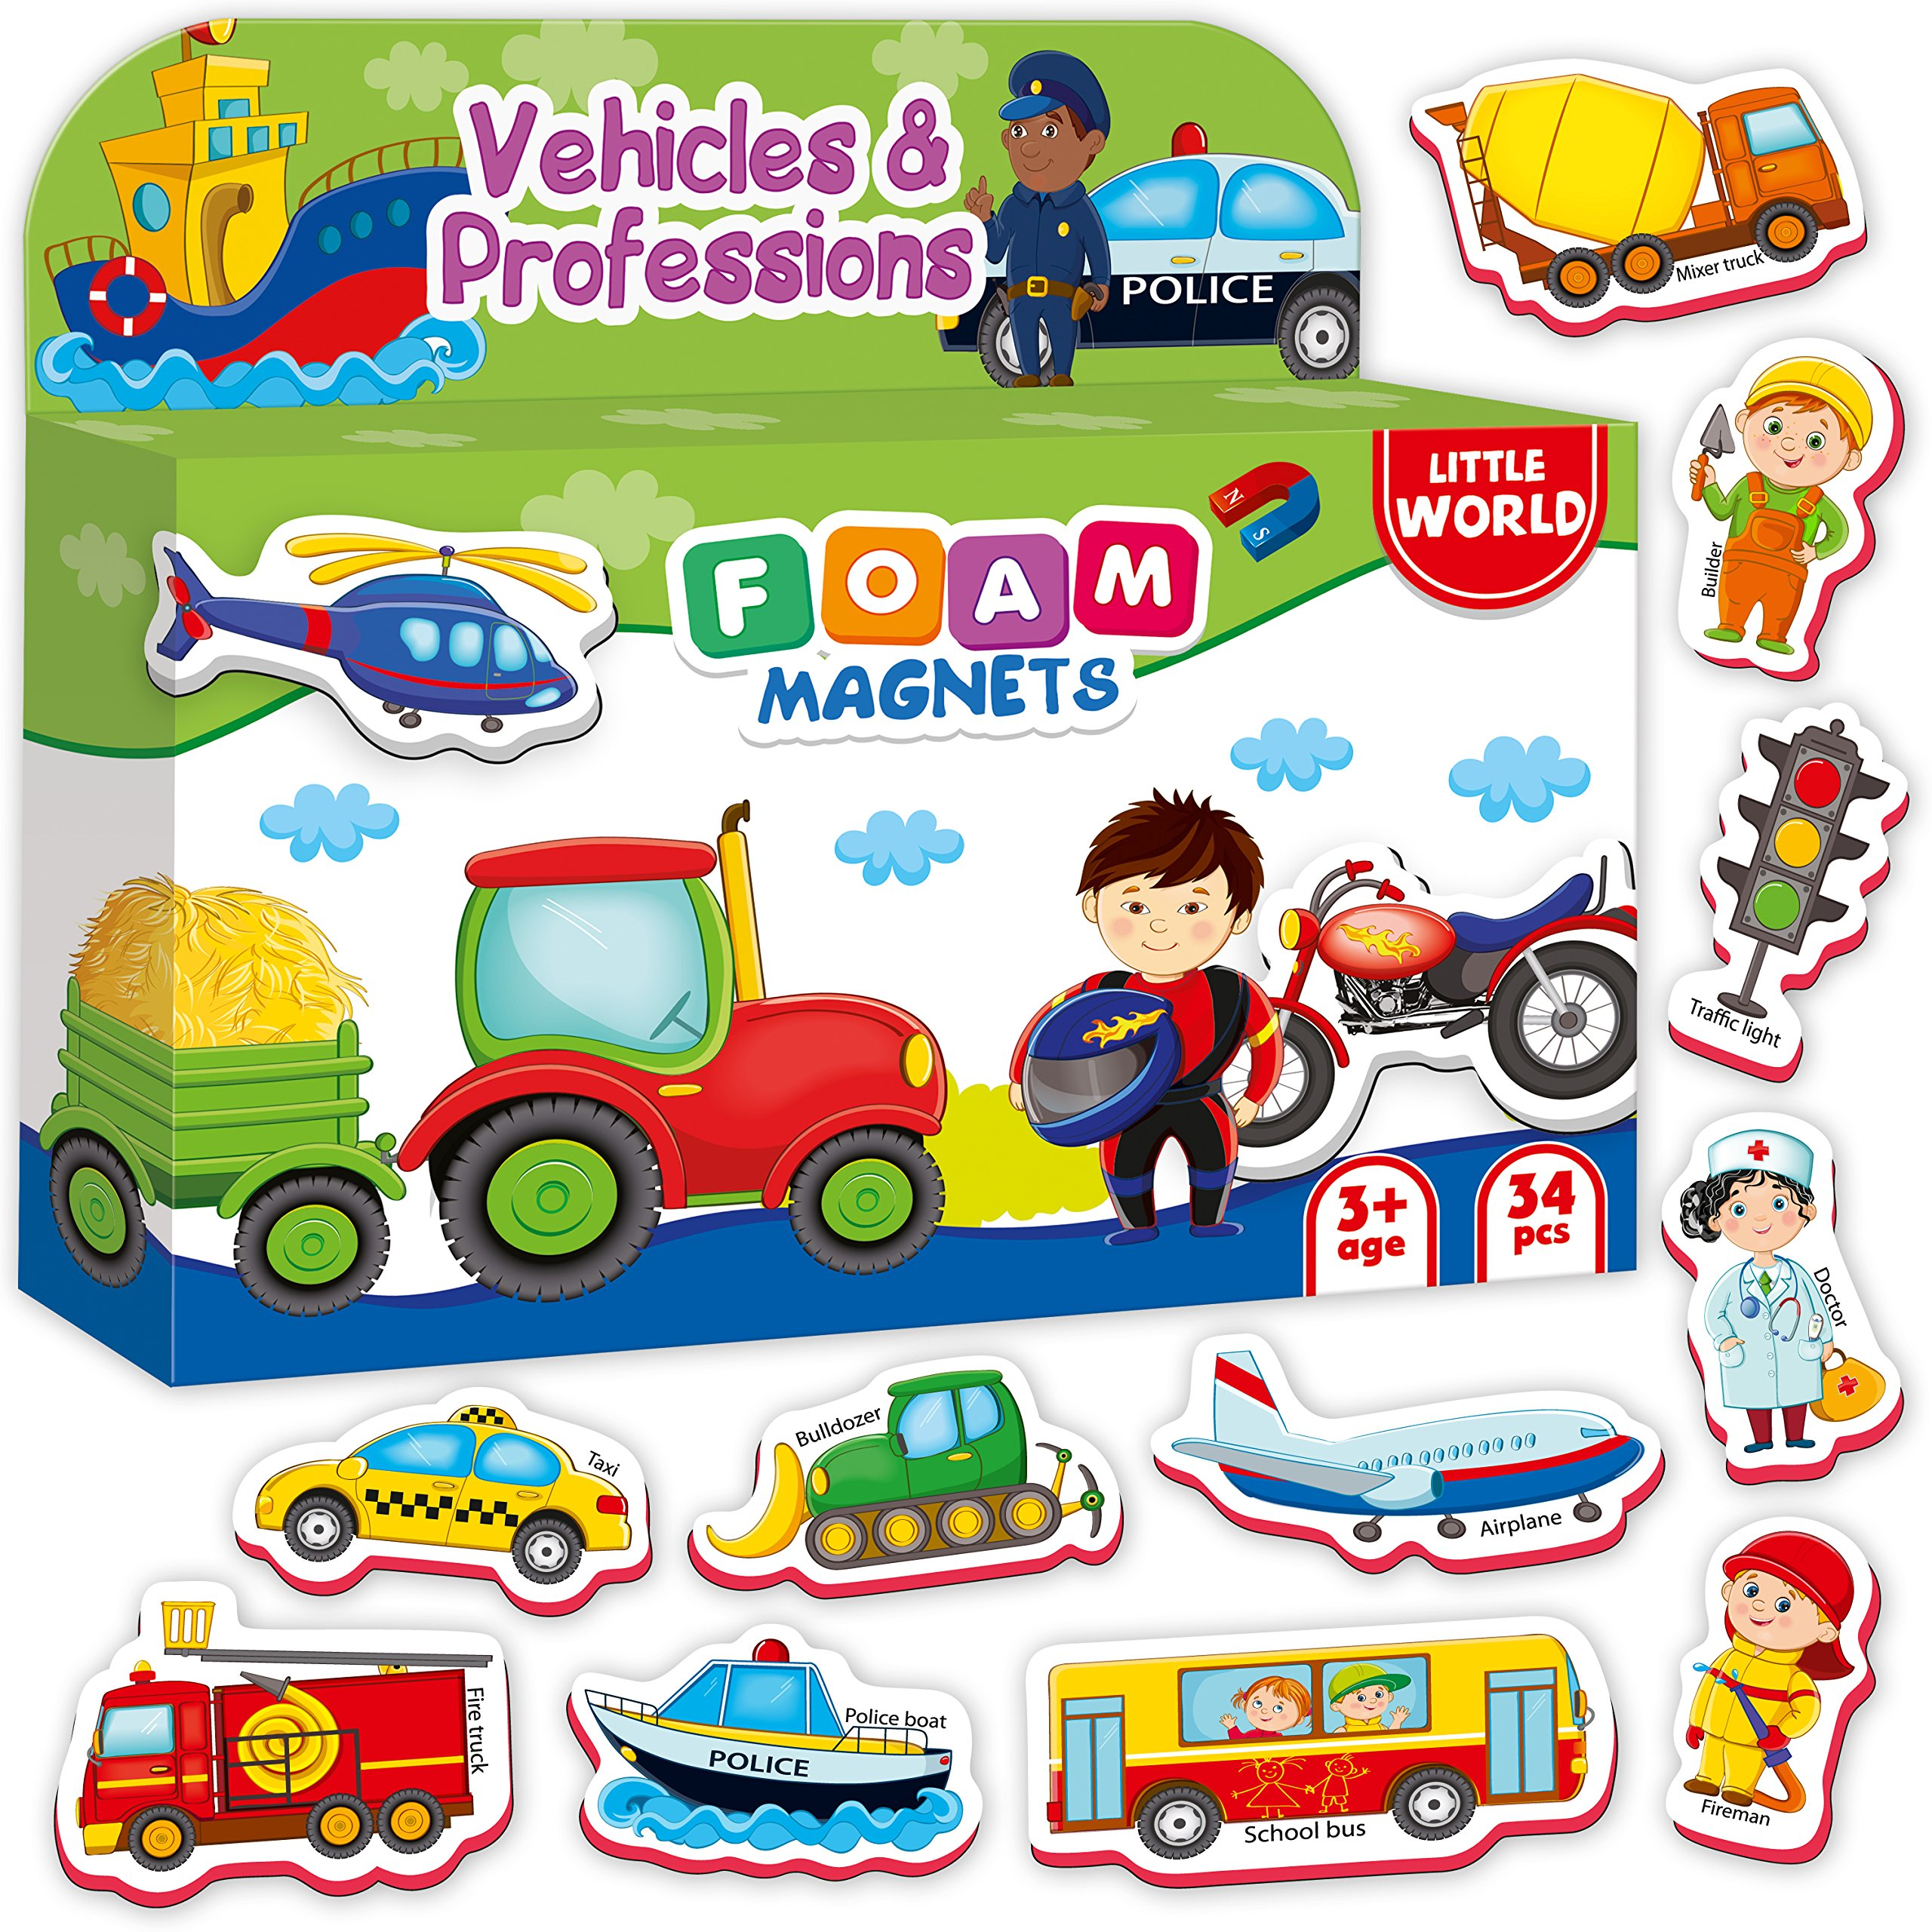 34 Foam Magnets for Kids VEHICLES, TRUCKS, PROFESSIONS - Kid Magnets for Refrigerator - Baby Magnets for Fridge - Refrigerator Magnets for Toddlers Babies Children - Toddler Magnets age 1 2 3 old boys by Little World